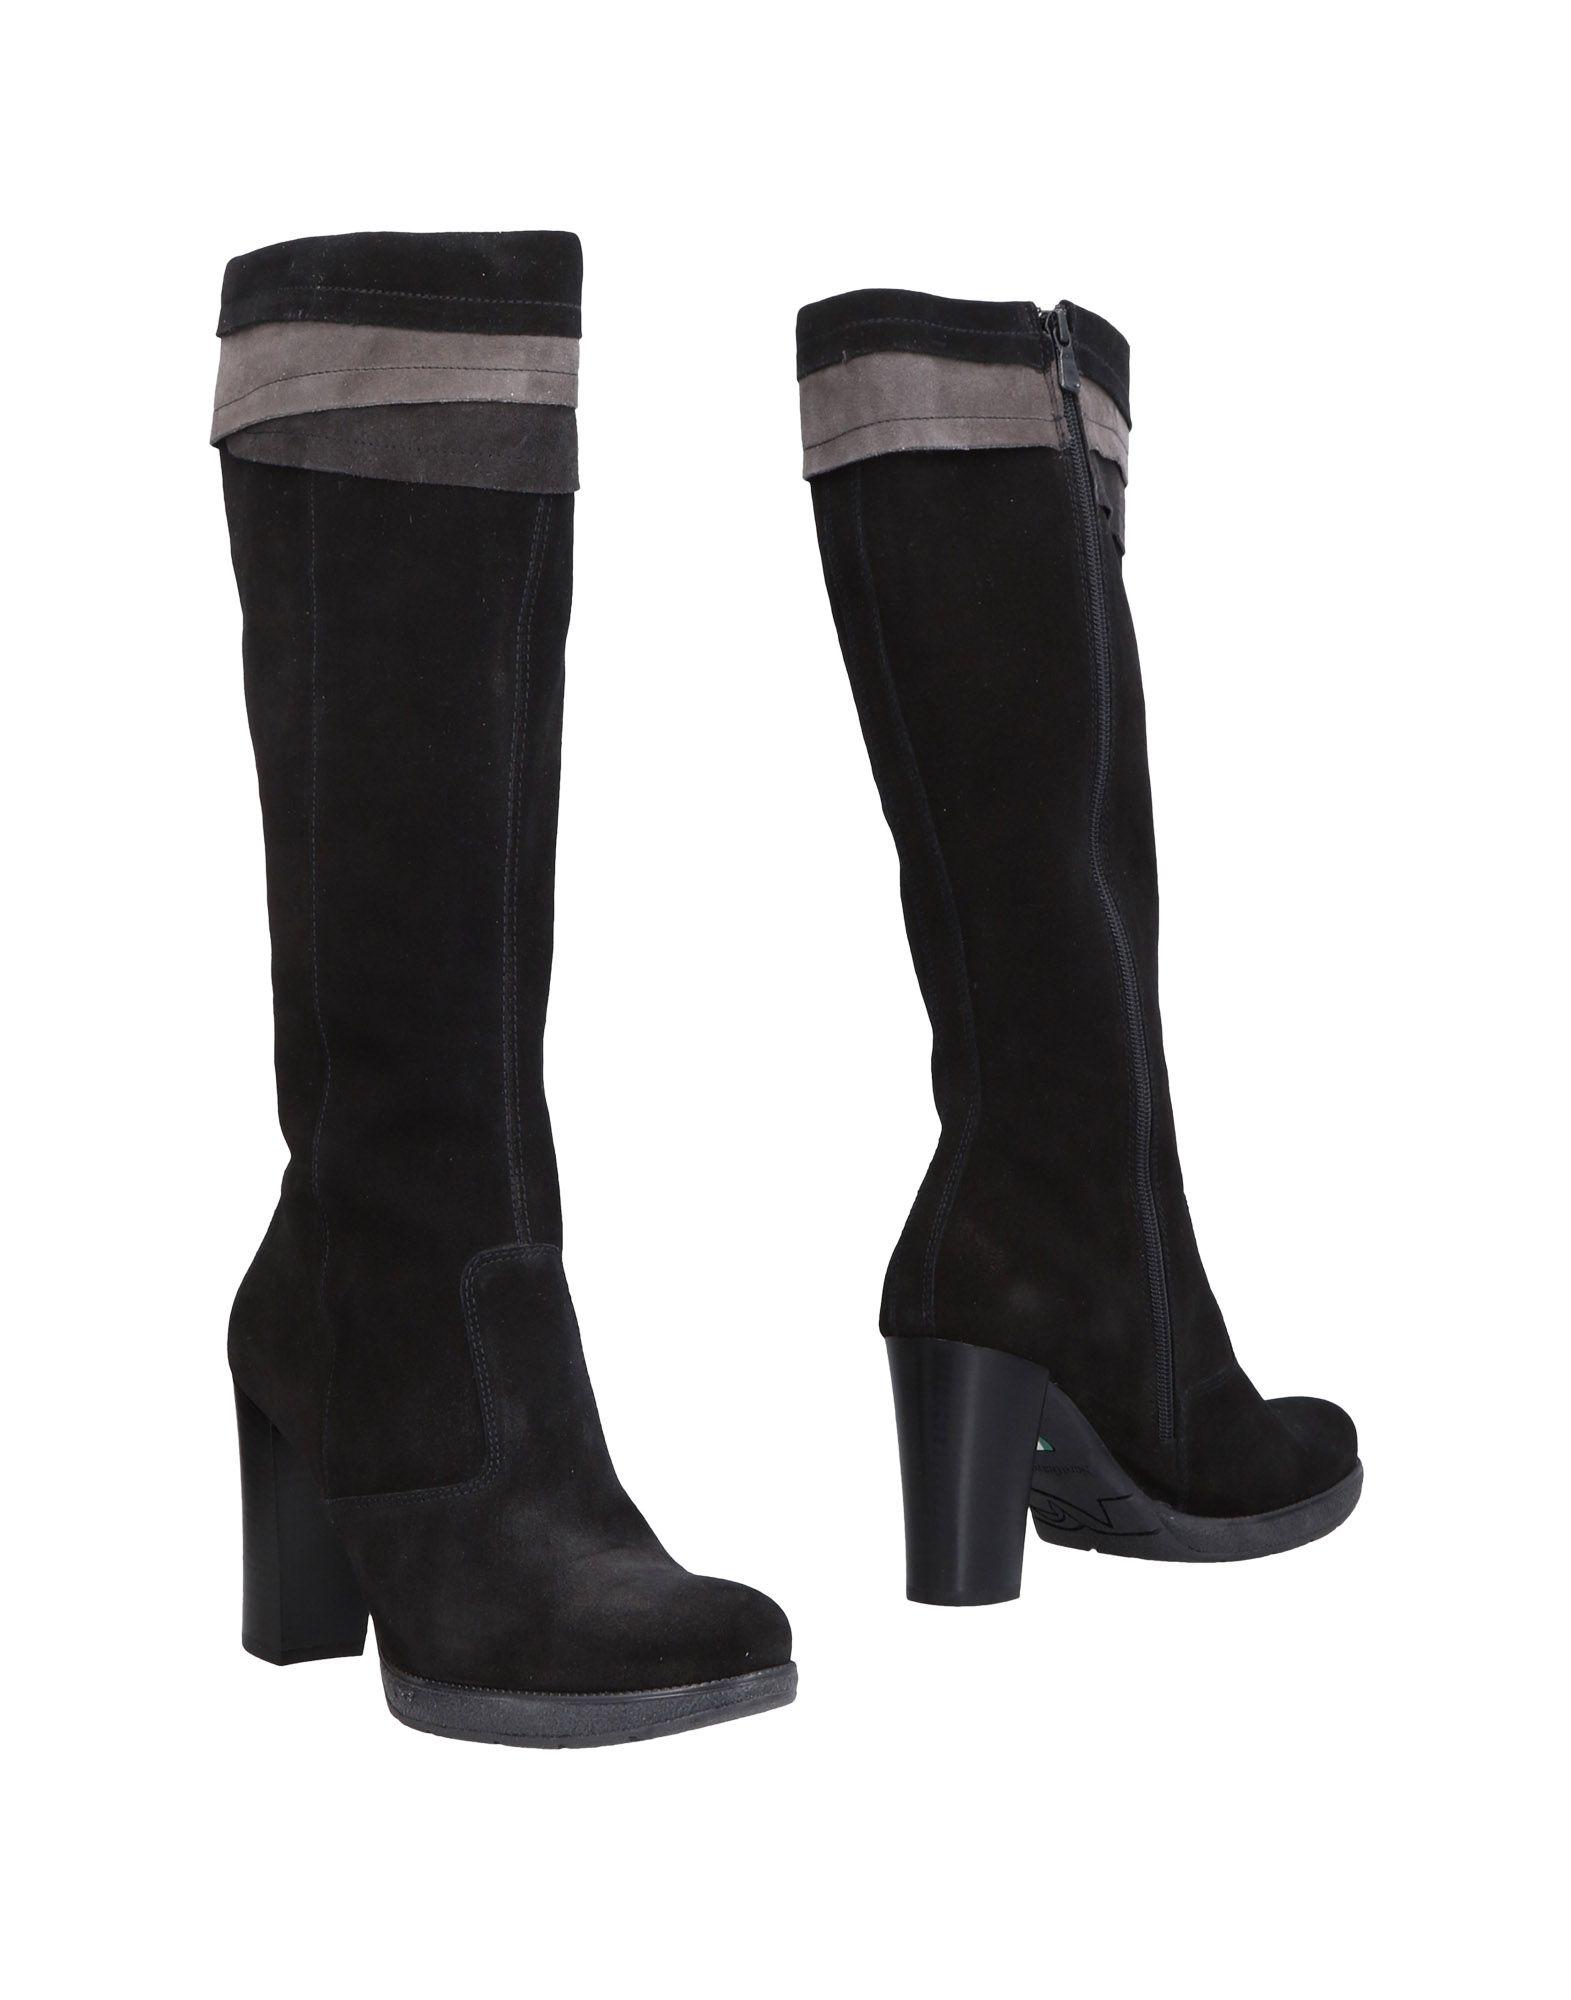 Ng Nero Giardini Stiefel Damen  11458992MO Gute Qualität beliebte Schuhe